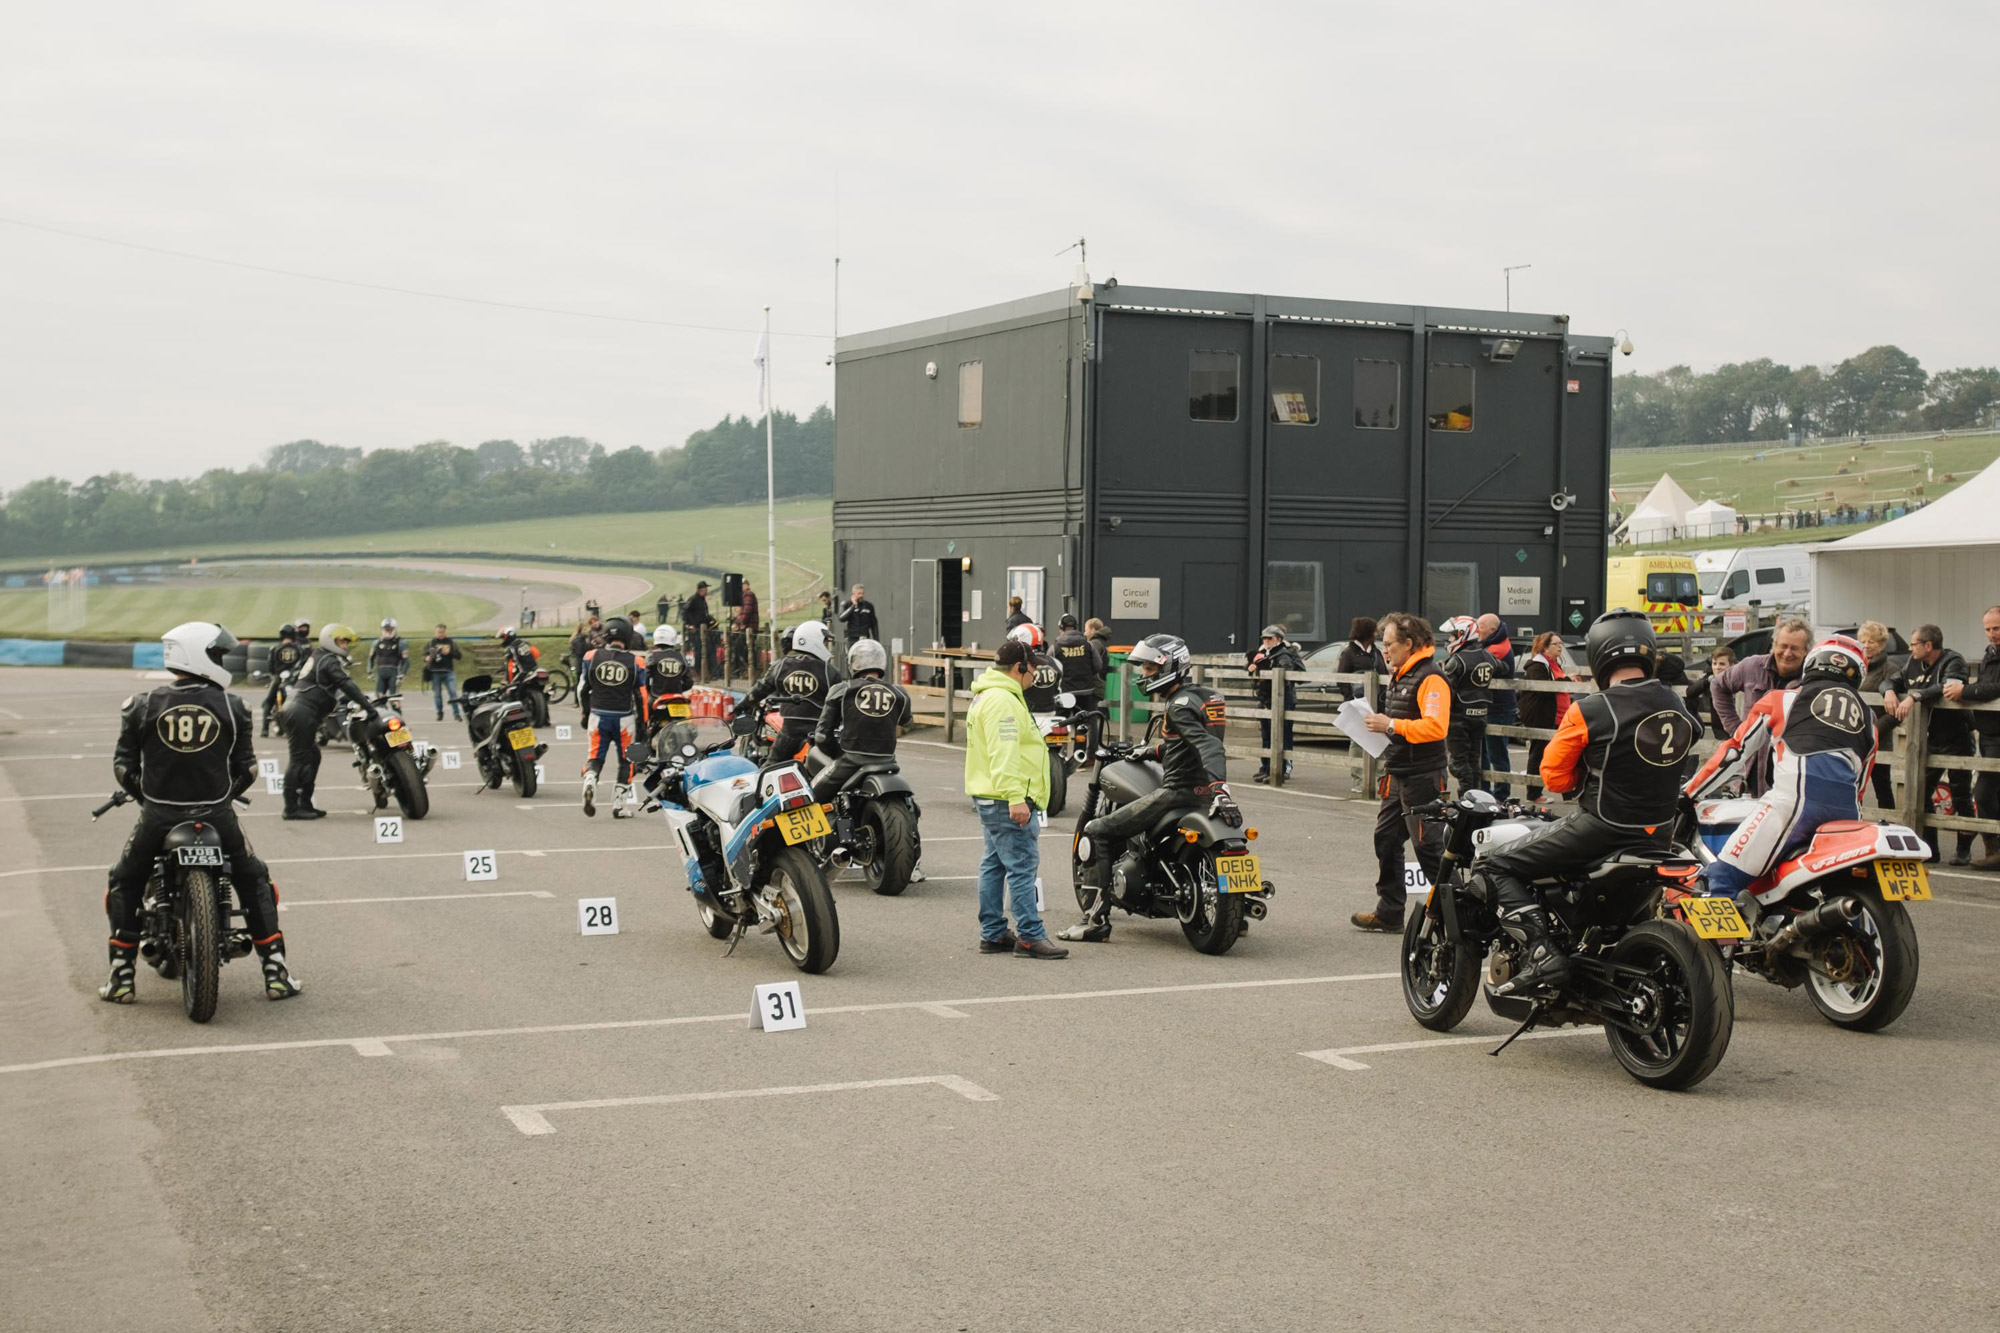 ashley-watson_bike-shed-festival-2.jpg